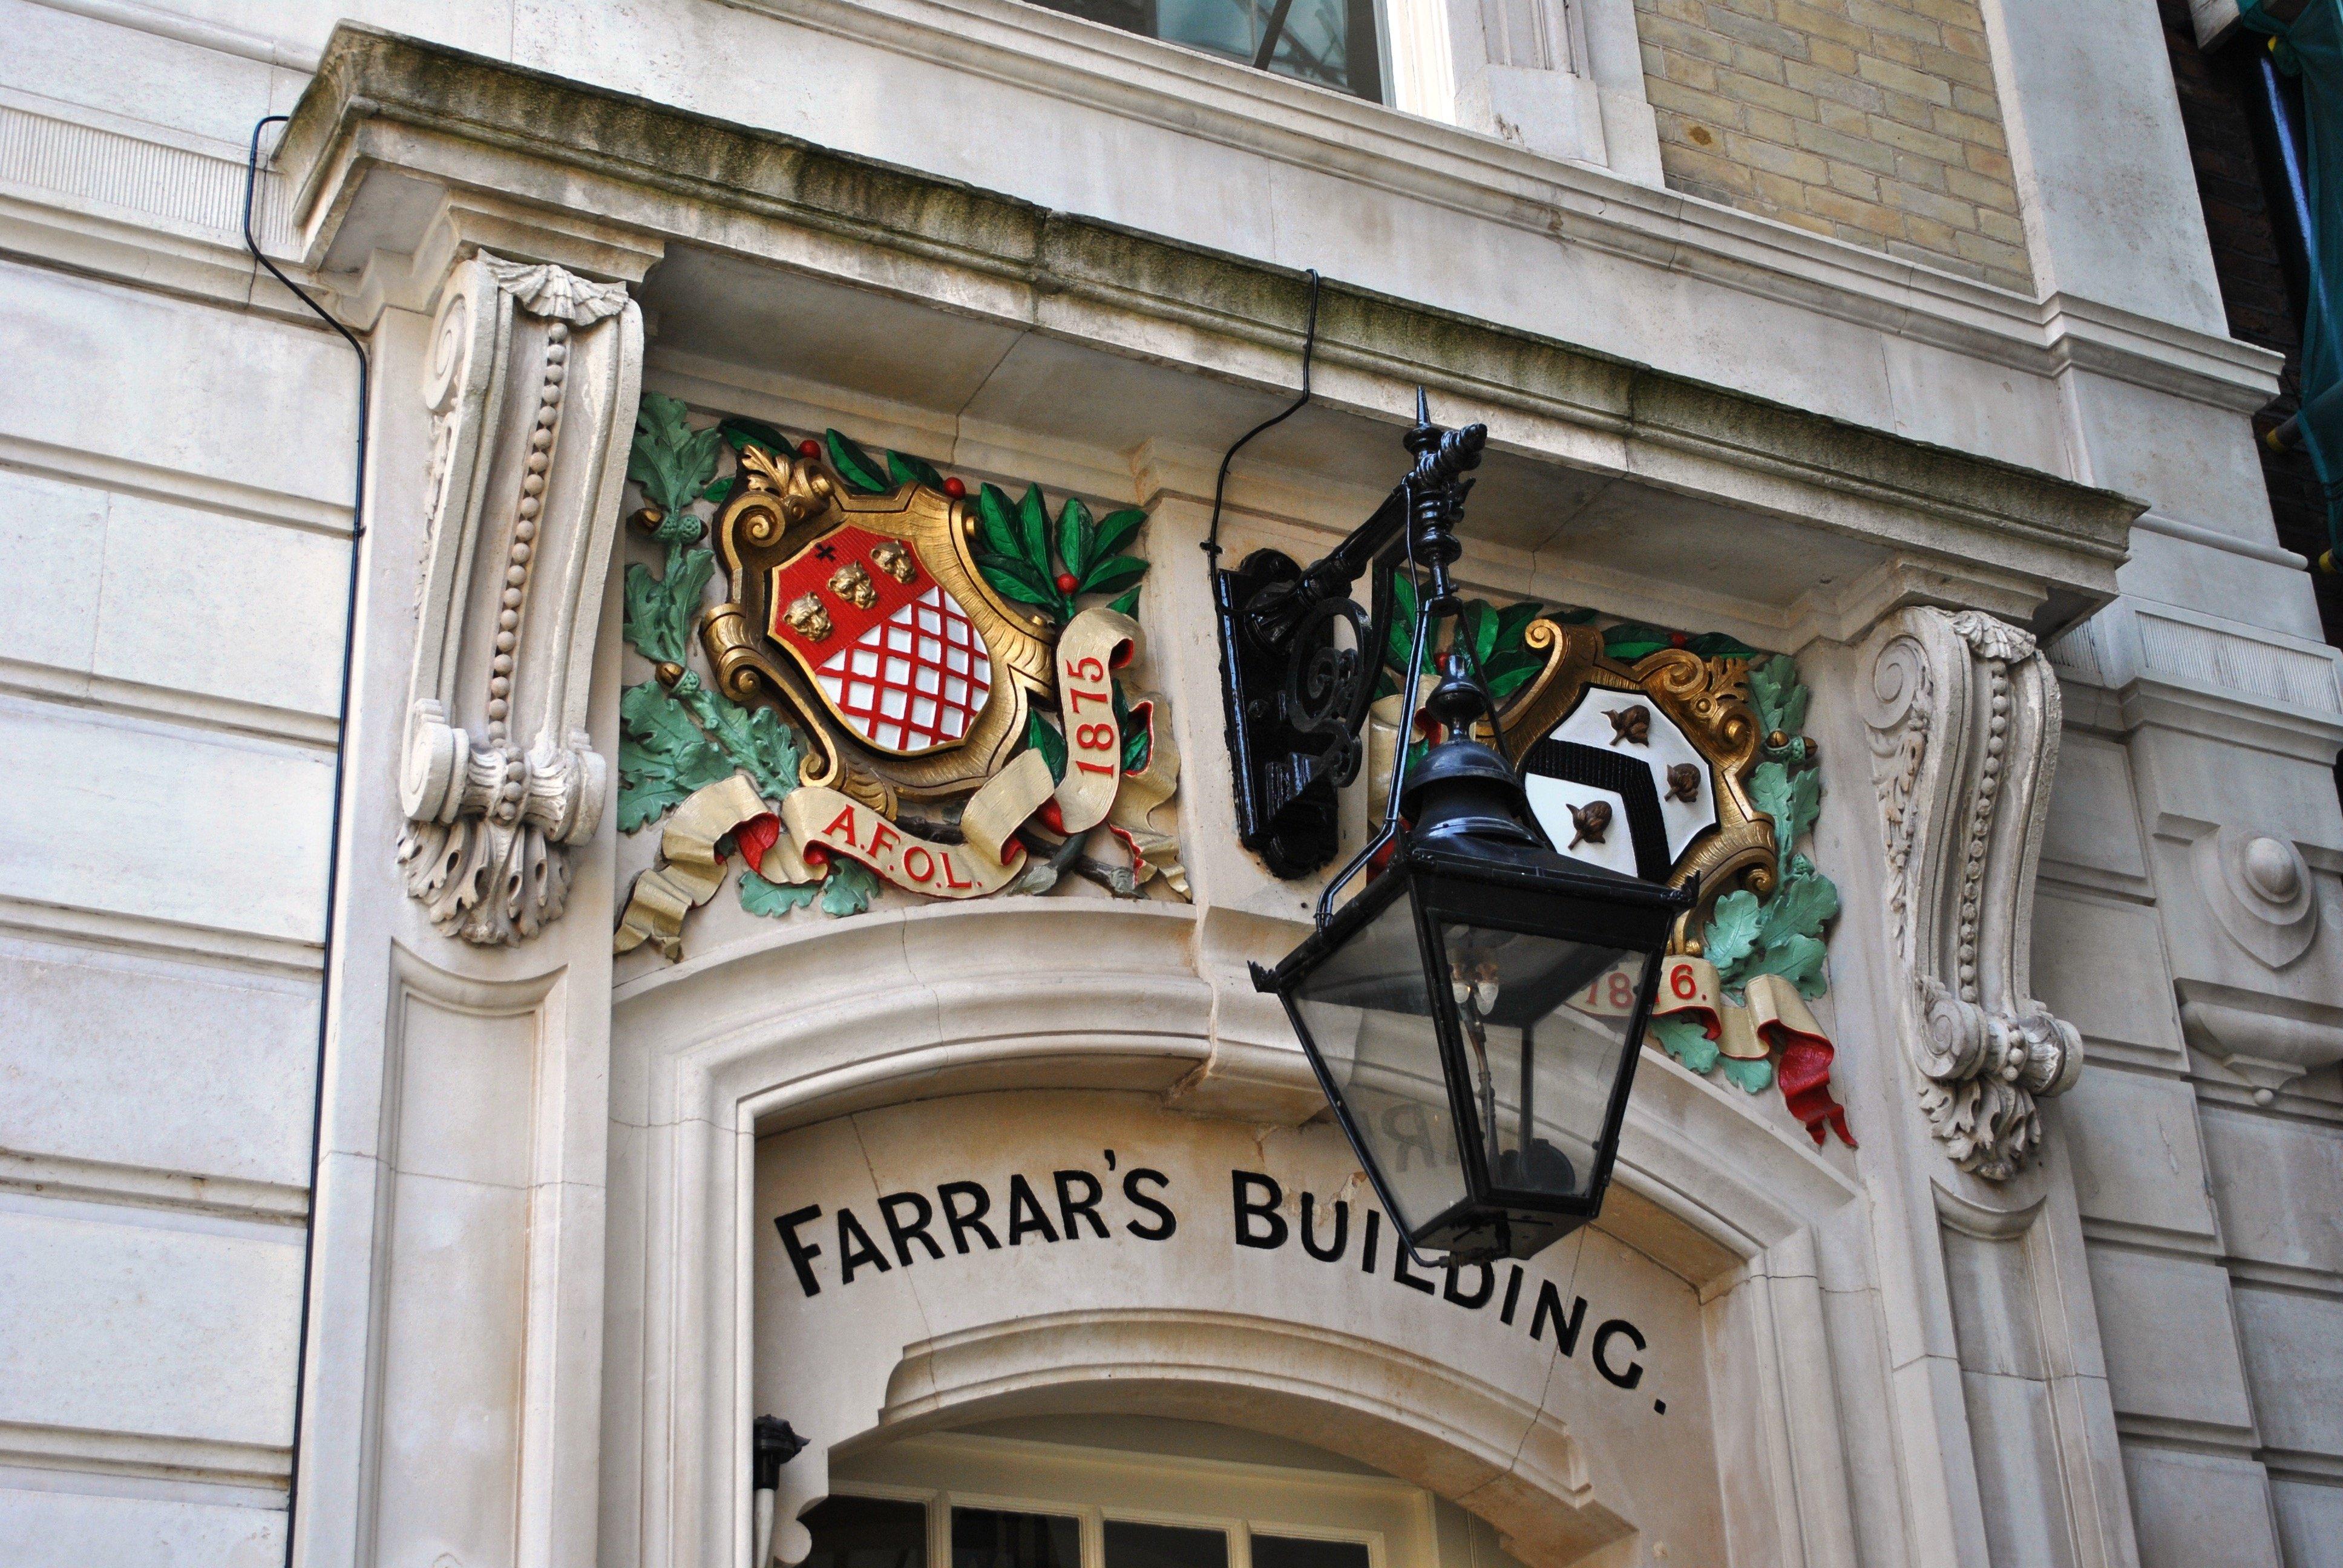 Farrar's Building Inner Temple